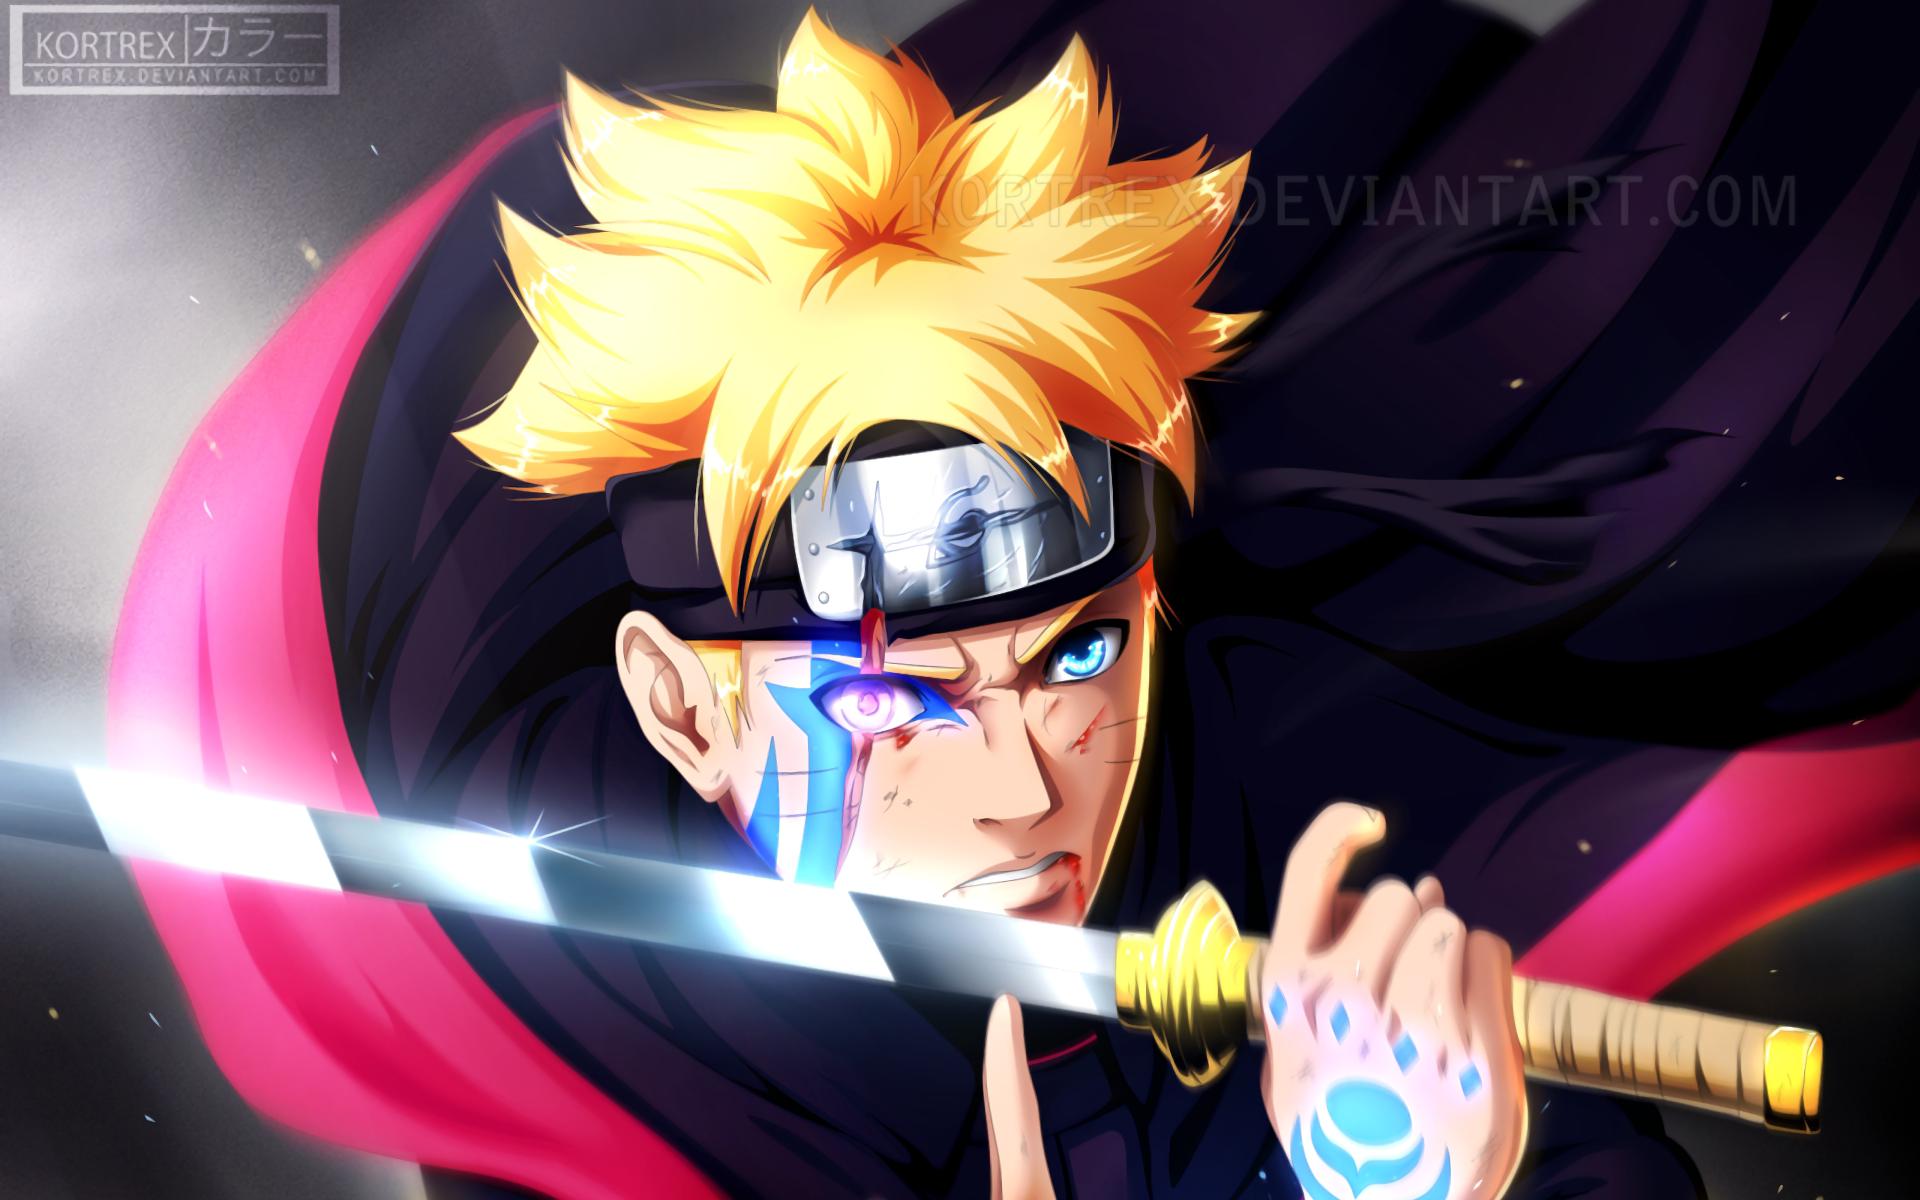 HD Wallpaper Boruto Blue Eyes Image in 2020 Anime